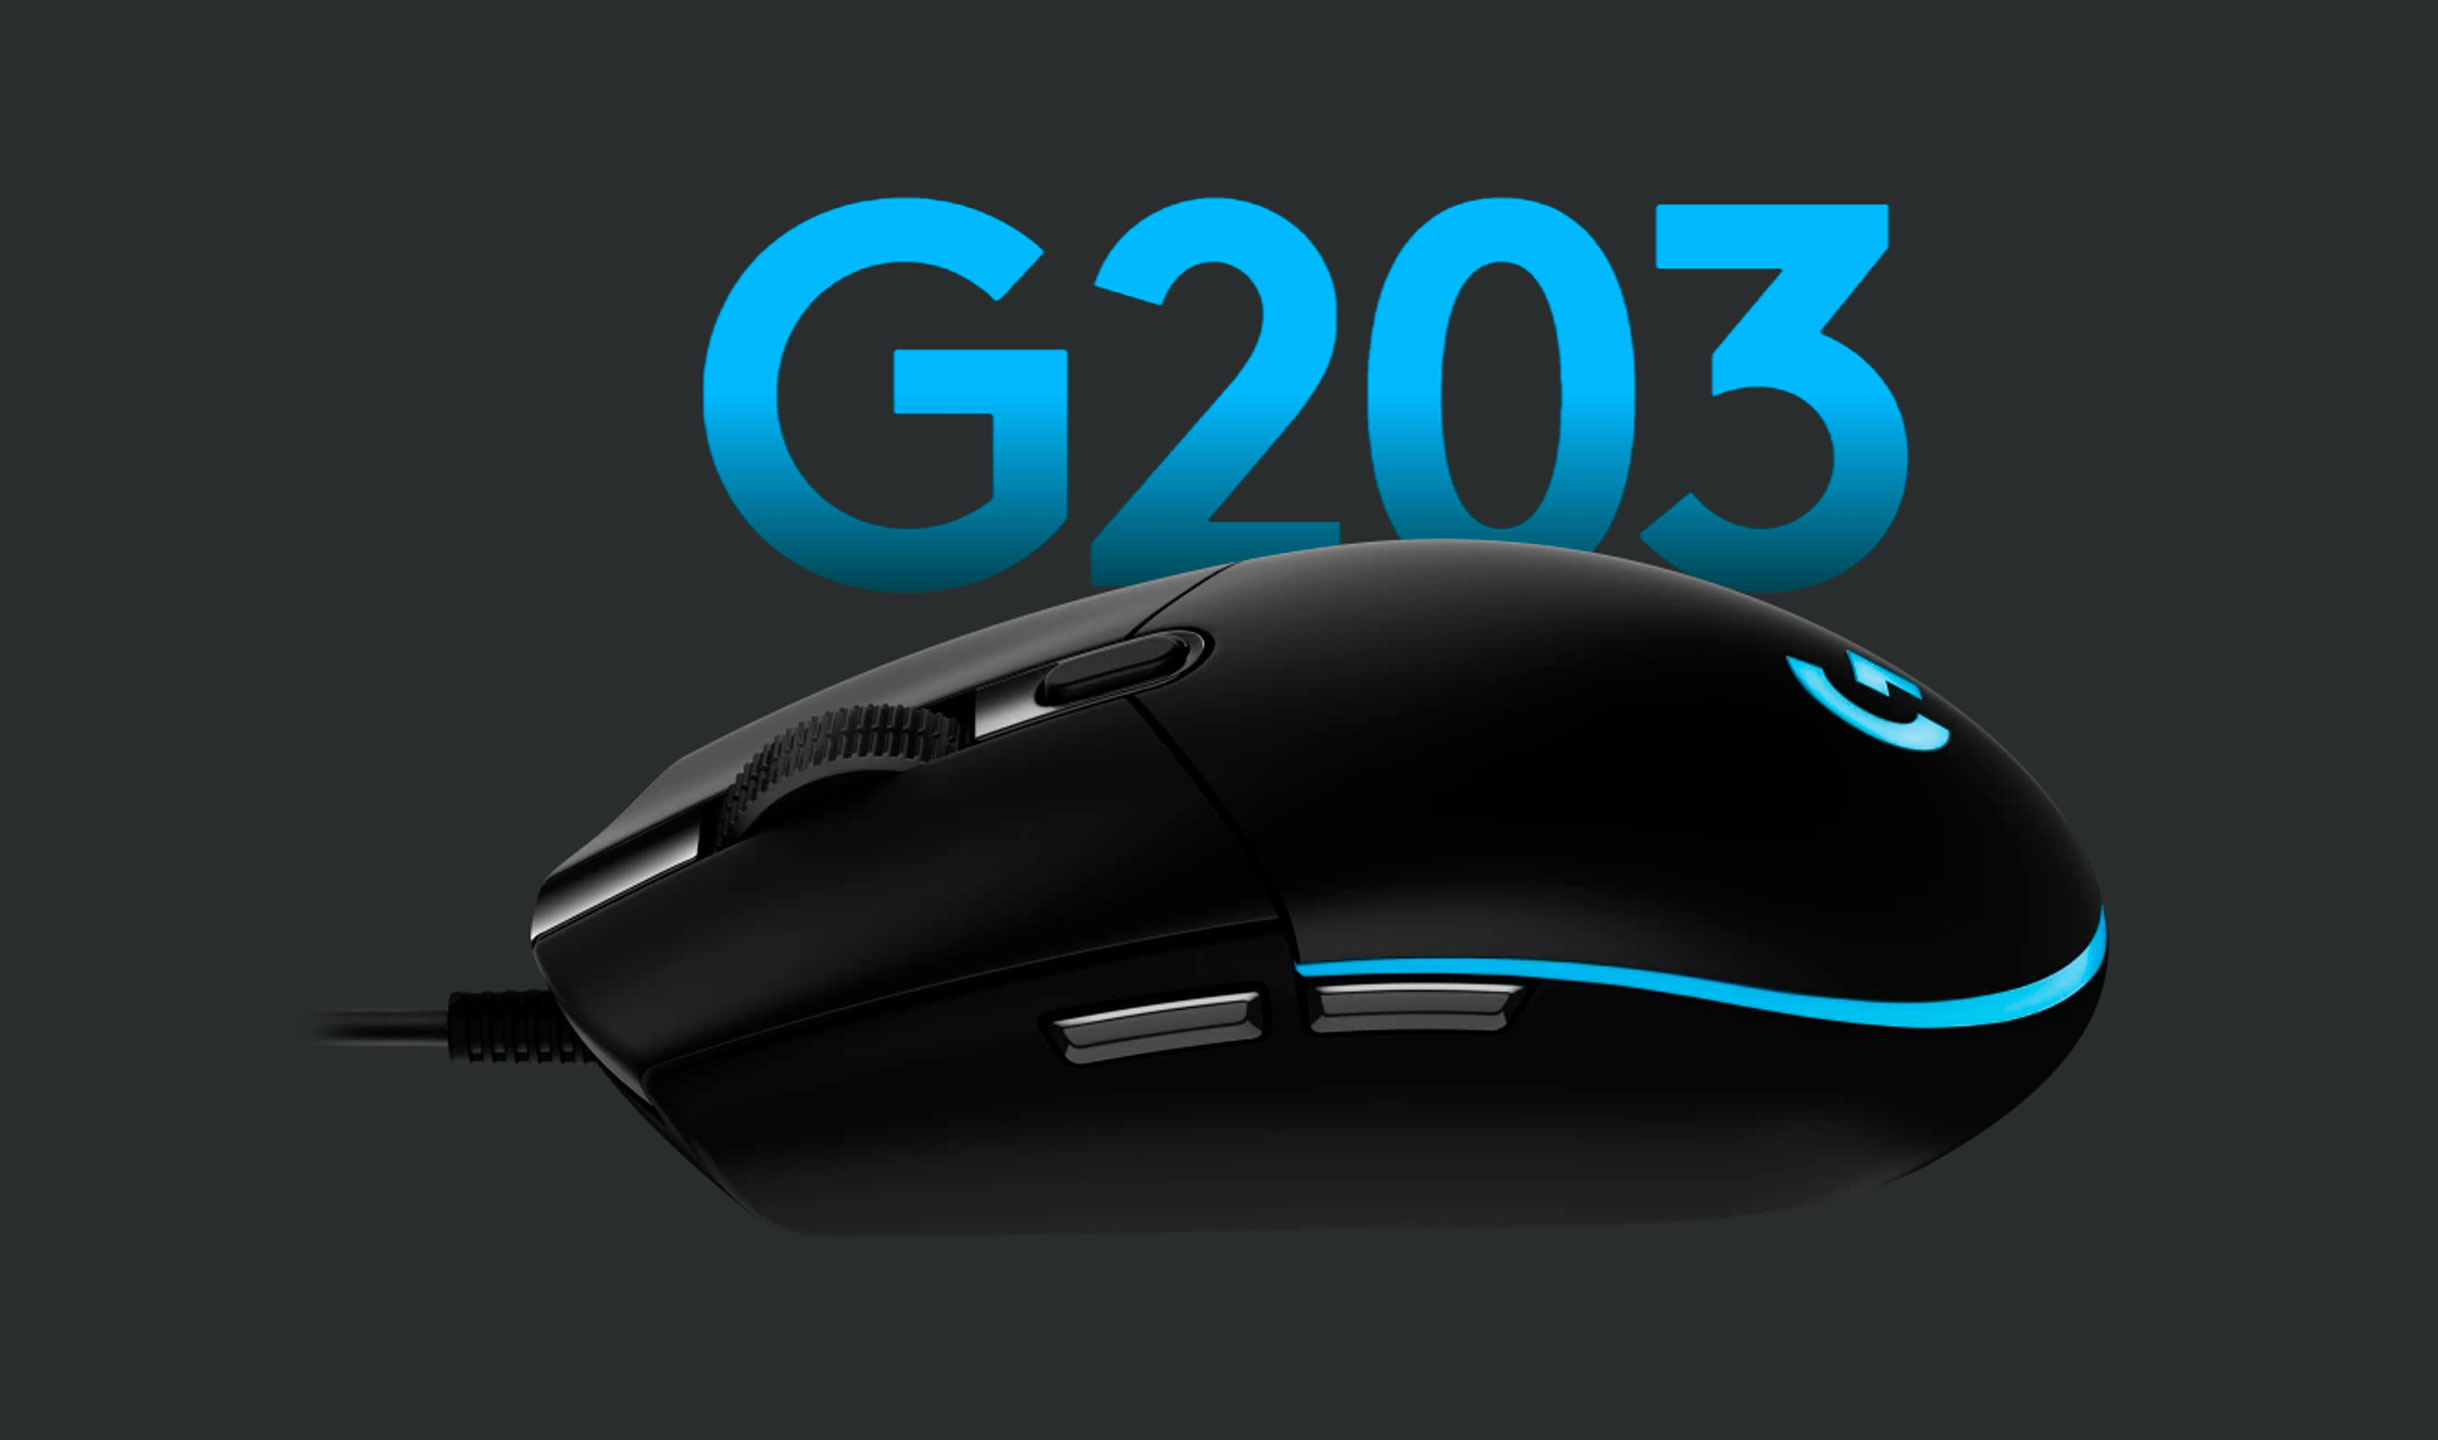 MOUSE LOGITECH PRODIGY G203 RGB